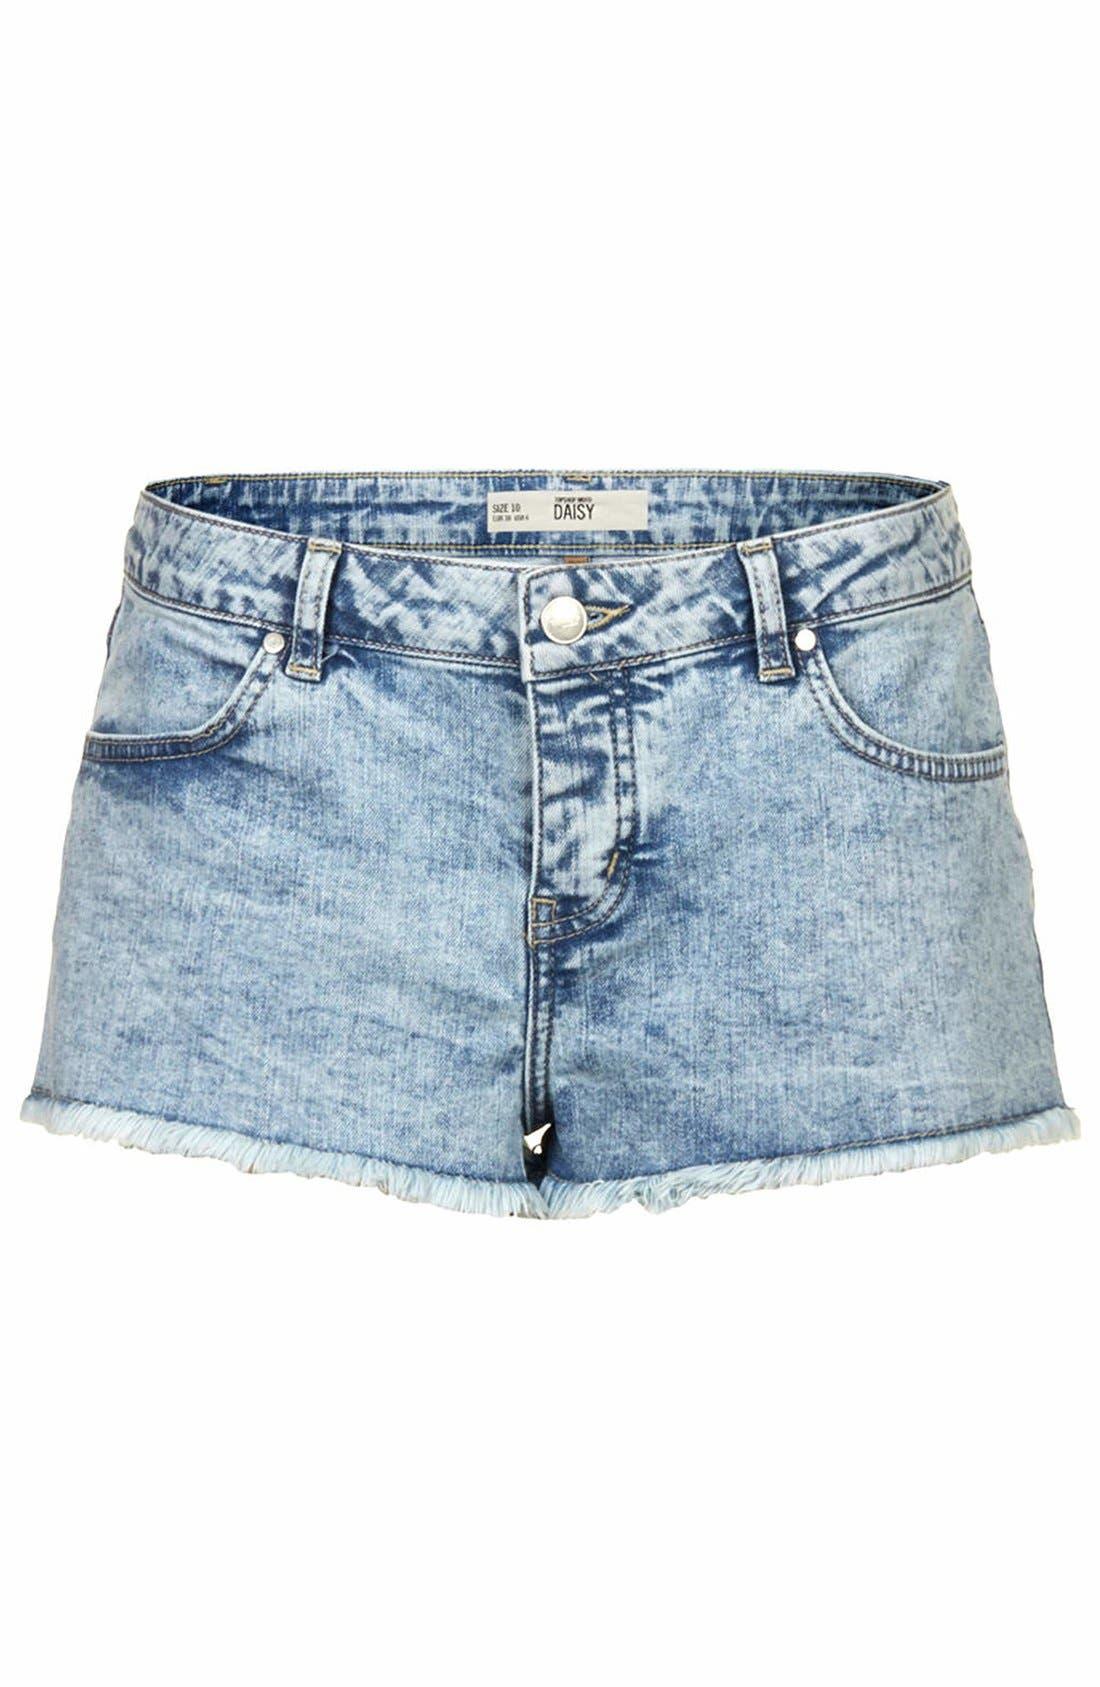 Alternate Image 3  - Topshop Moto 'Daisy' Denim Shorts (Light)